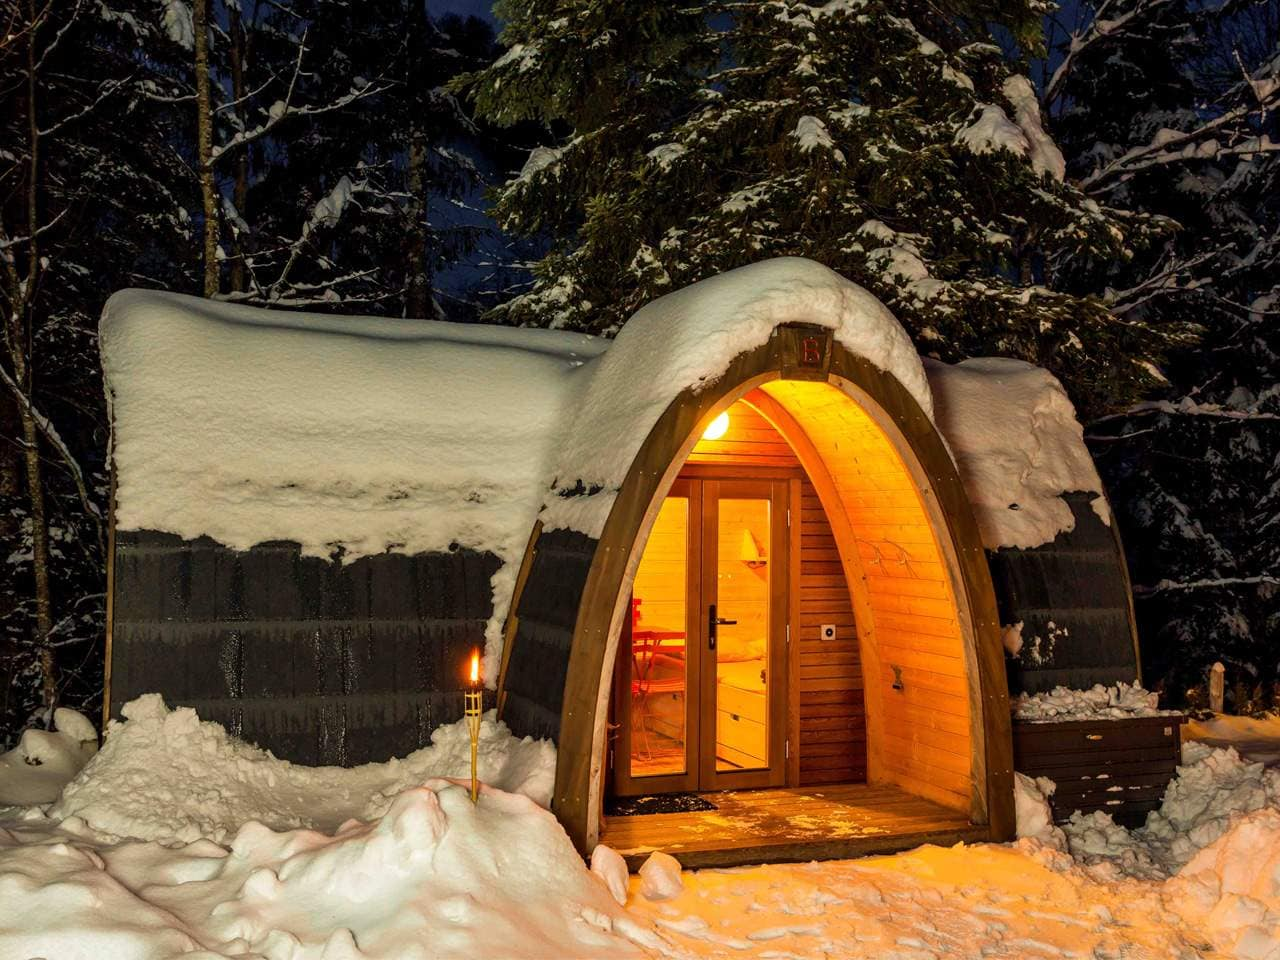 Winter-Familienabenteuer – Holziglu!